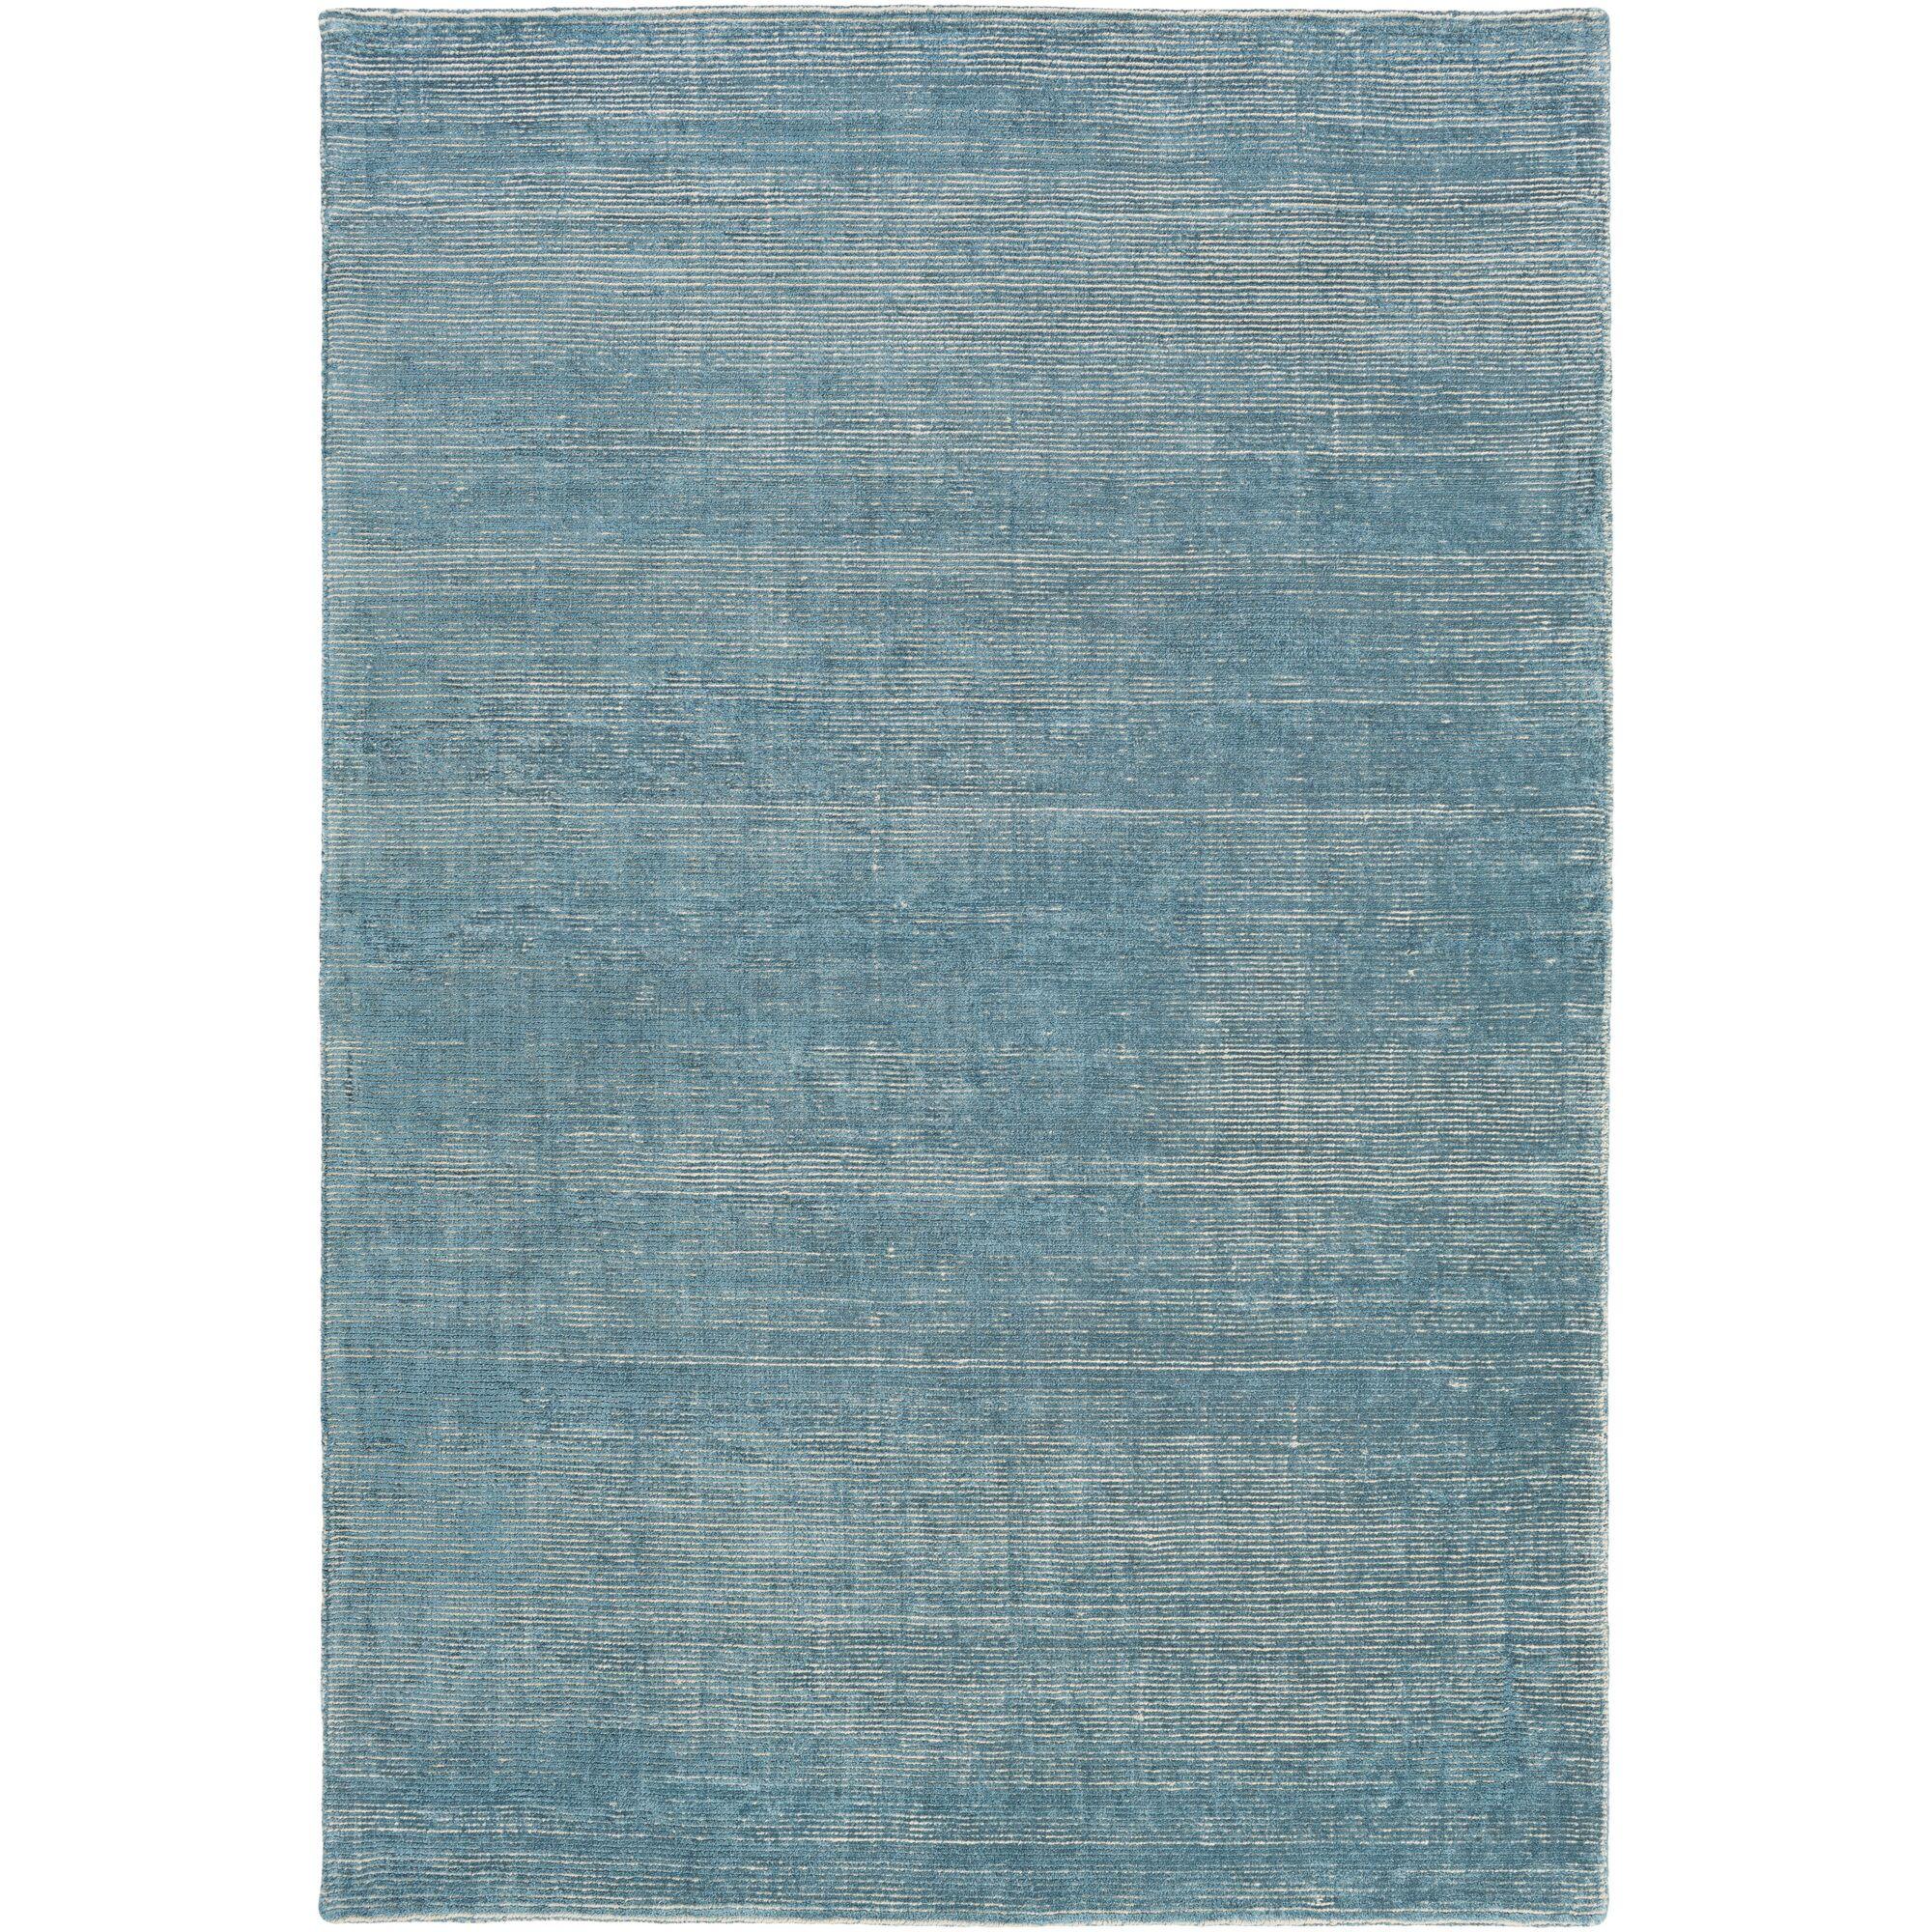 Codey Hand-Loomed Aqua/Khaki Area Rug Rug Size: Rectangle 6' x 9'